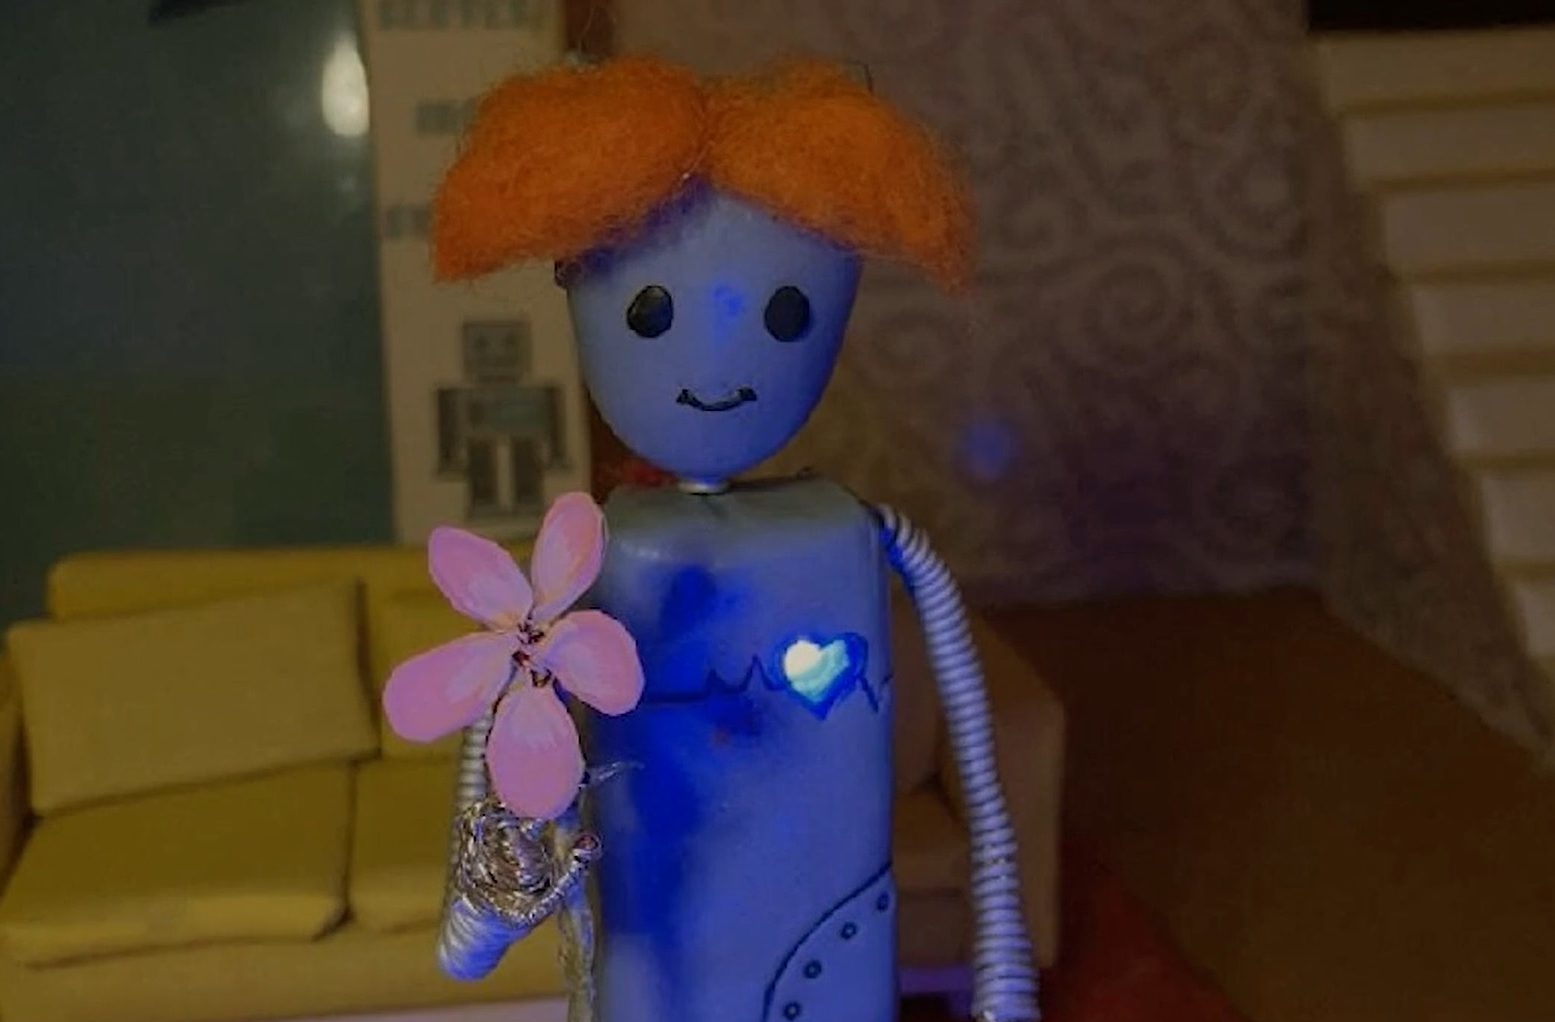 Do Robots Daydream of Television Reruns?